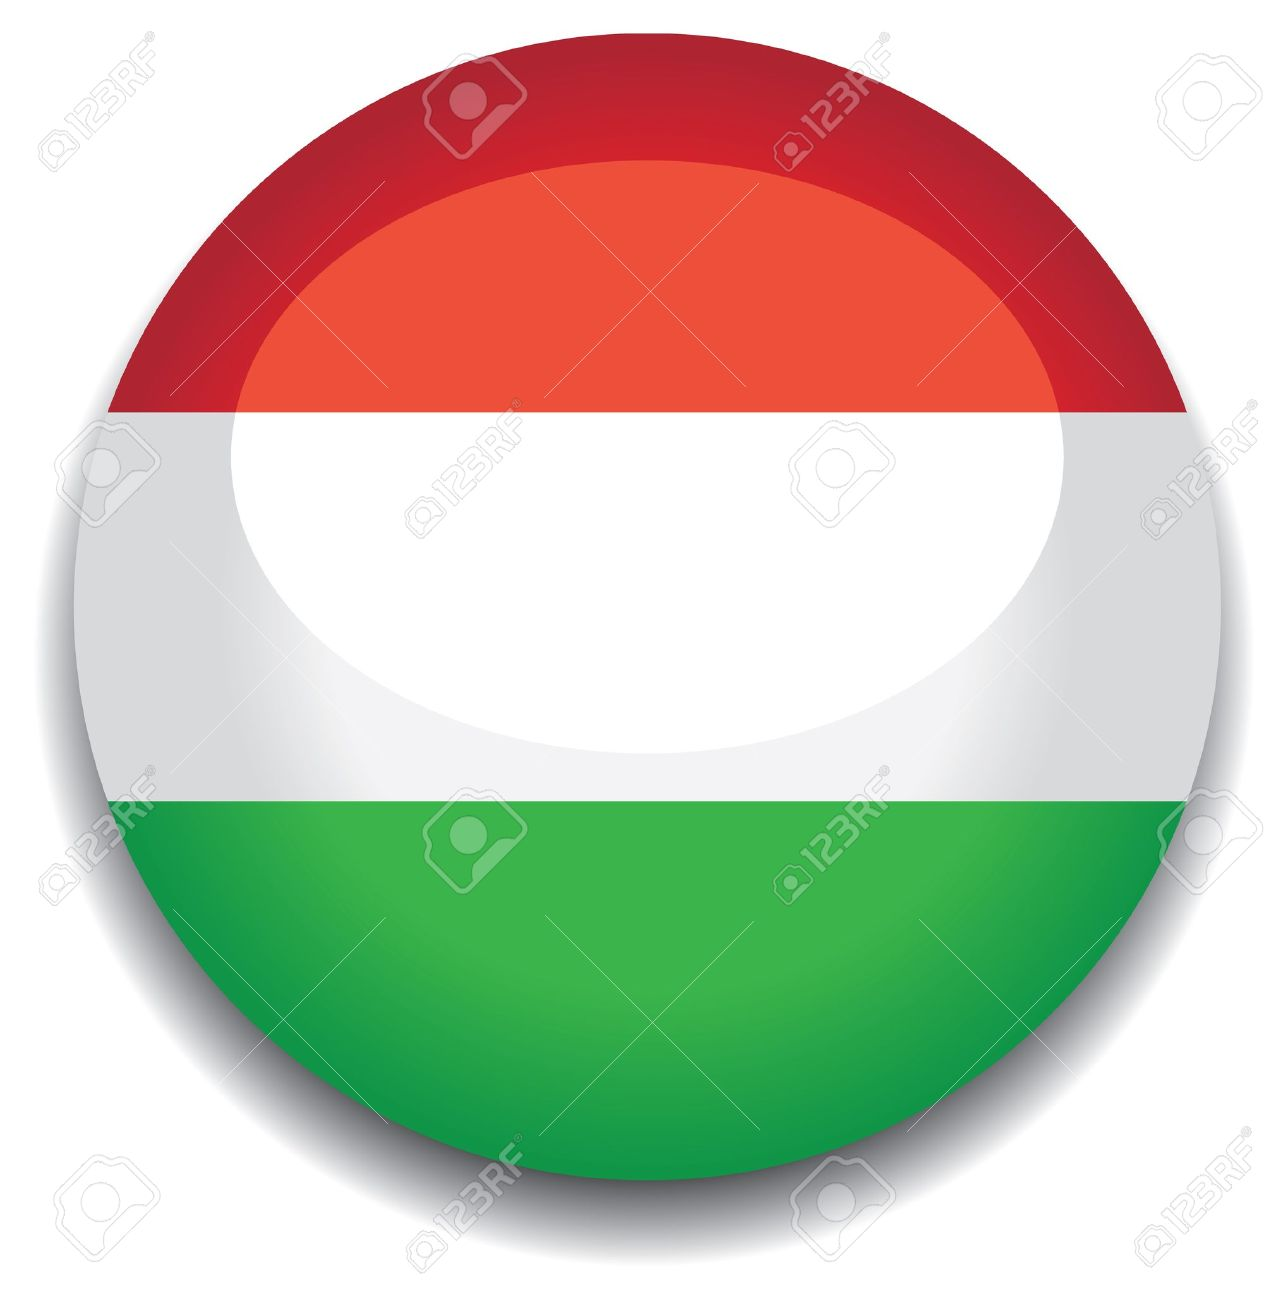 Hungary clipart #1